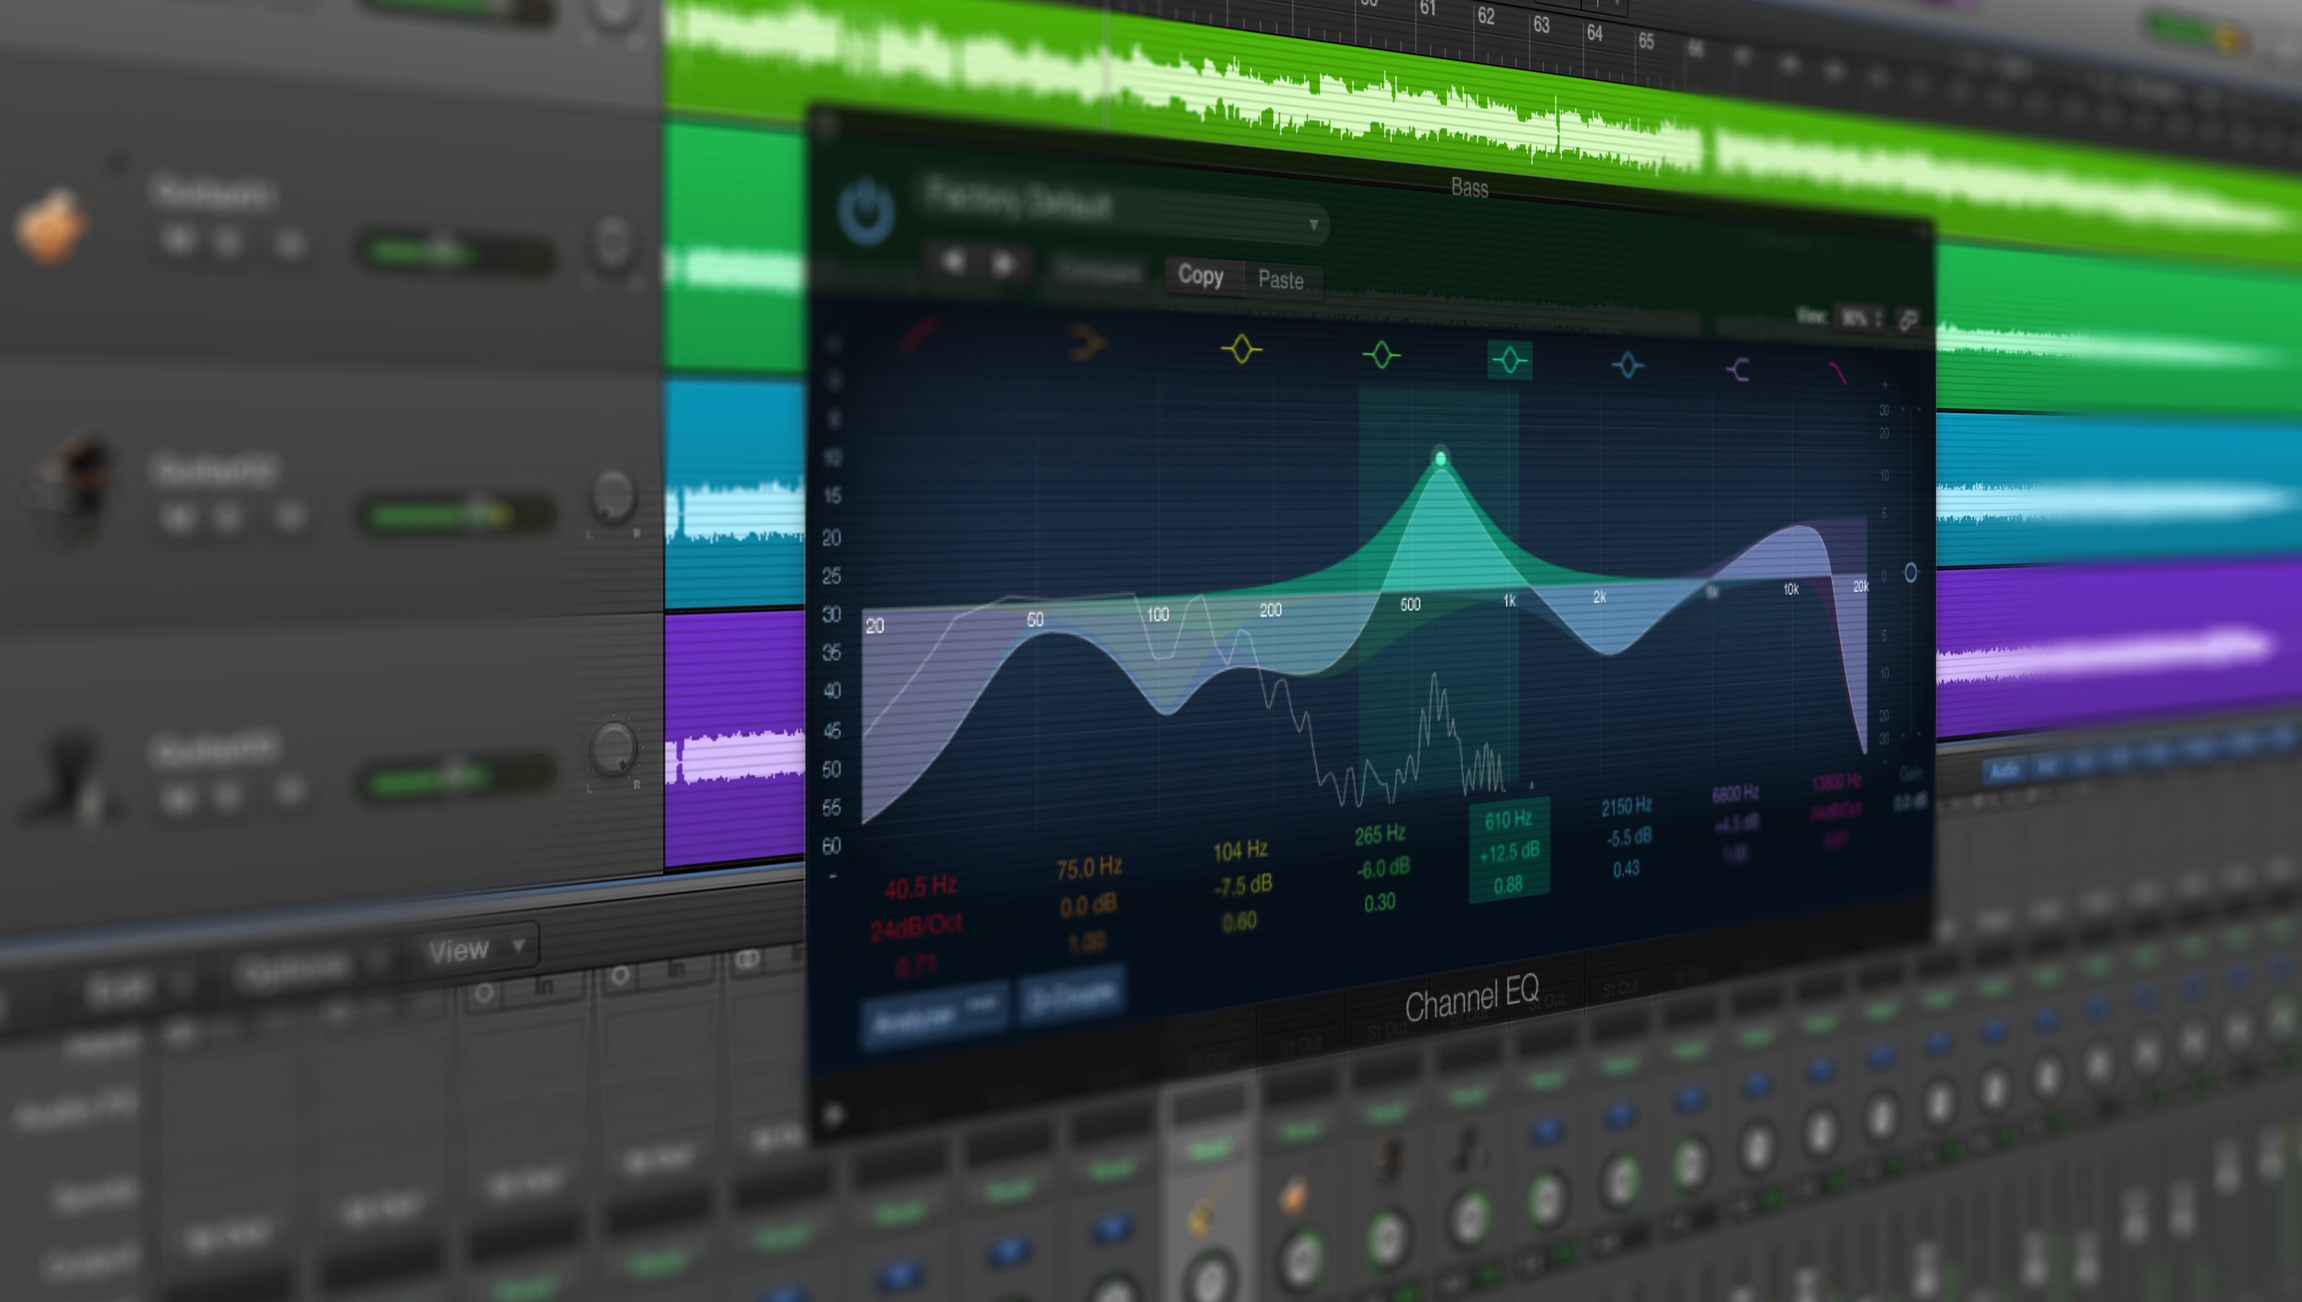 logiciel ordinateur mastering audio